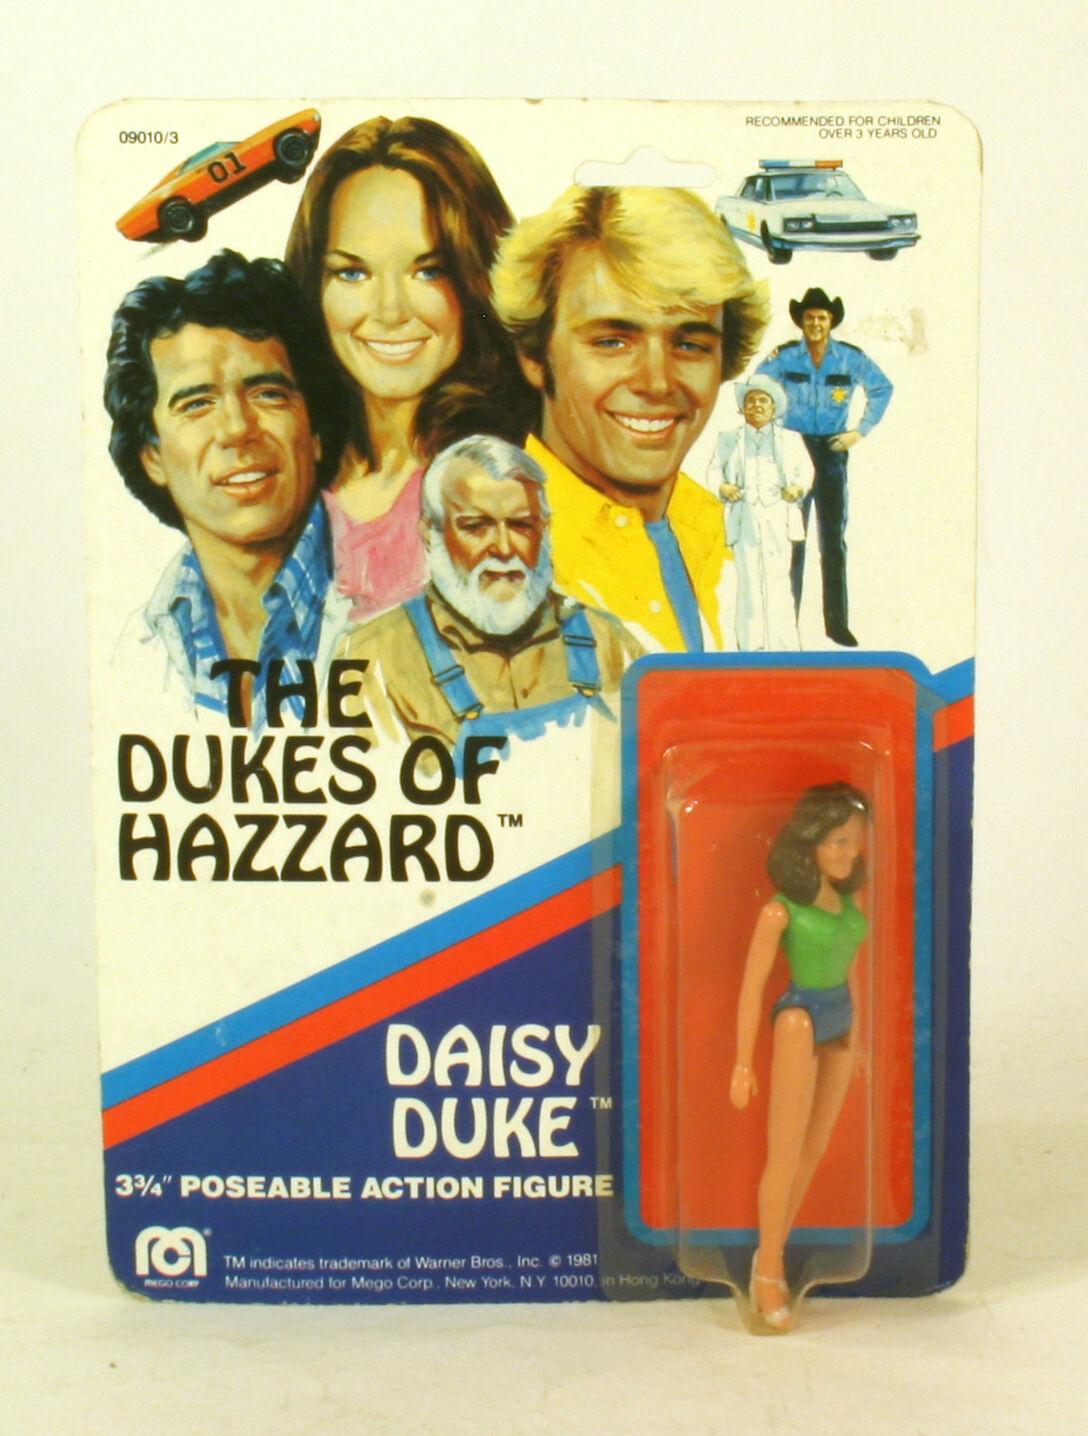 Jahrgang Mego Die Dukes of Hazzard Daisy Duke MOC